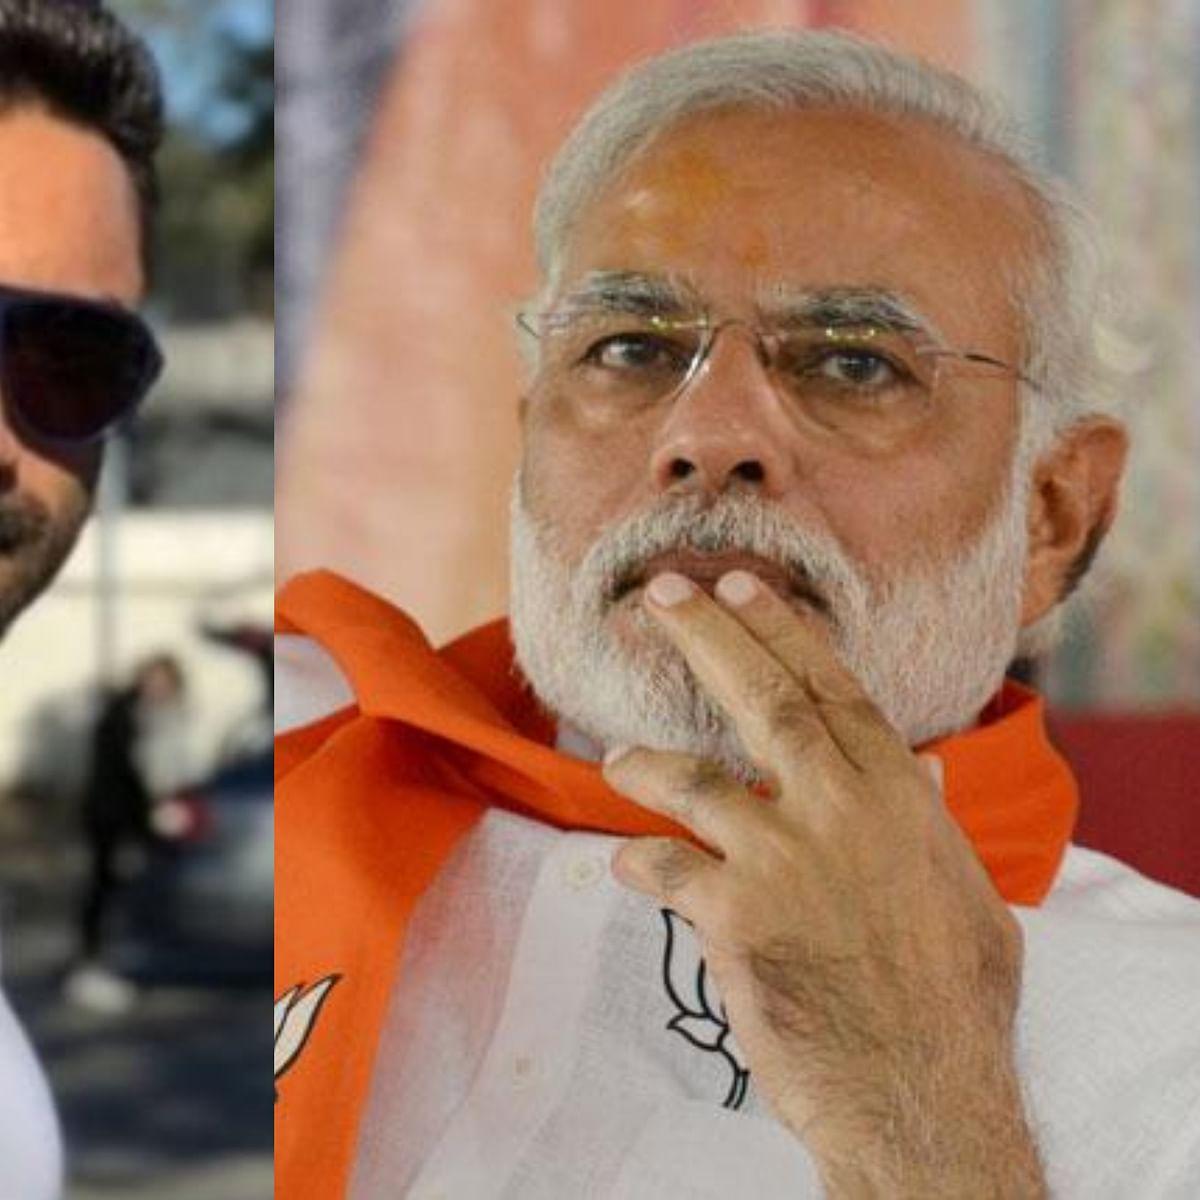 Wait, what? Mahika Sharma thinks Ajaz Khan will become India's PM